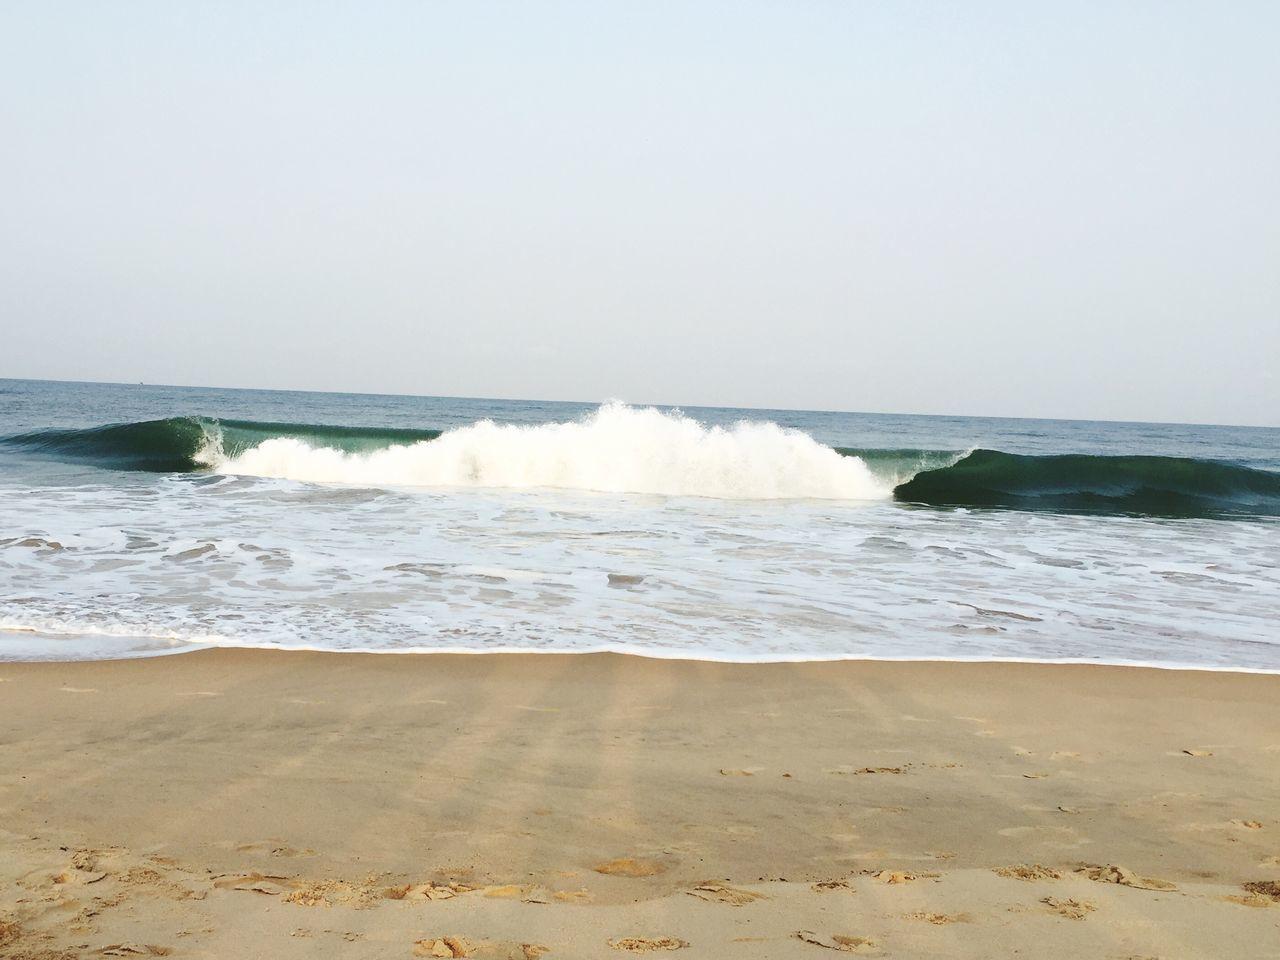 Sea And Sky Sea_collection Seaside Sea View Seashore Seascape Photography Sea And Sand Sea And Waves Sea And Beach